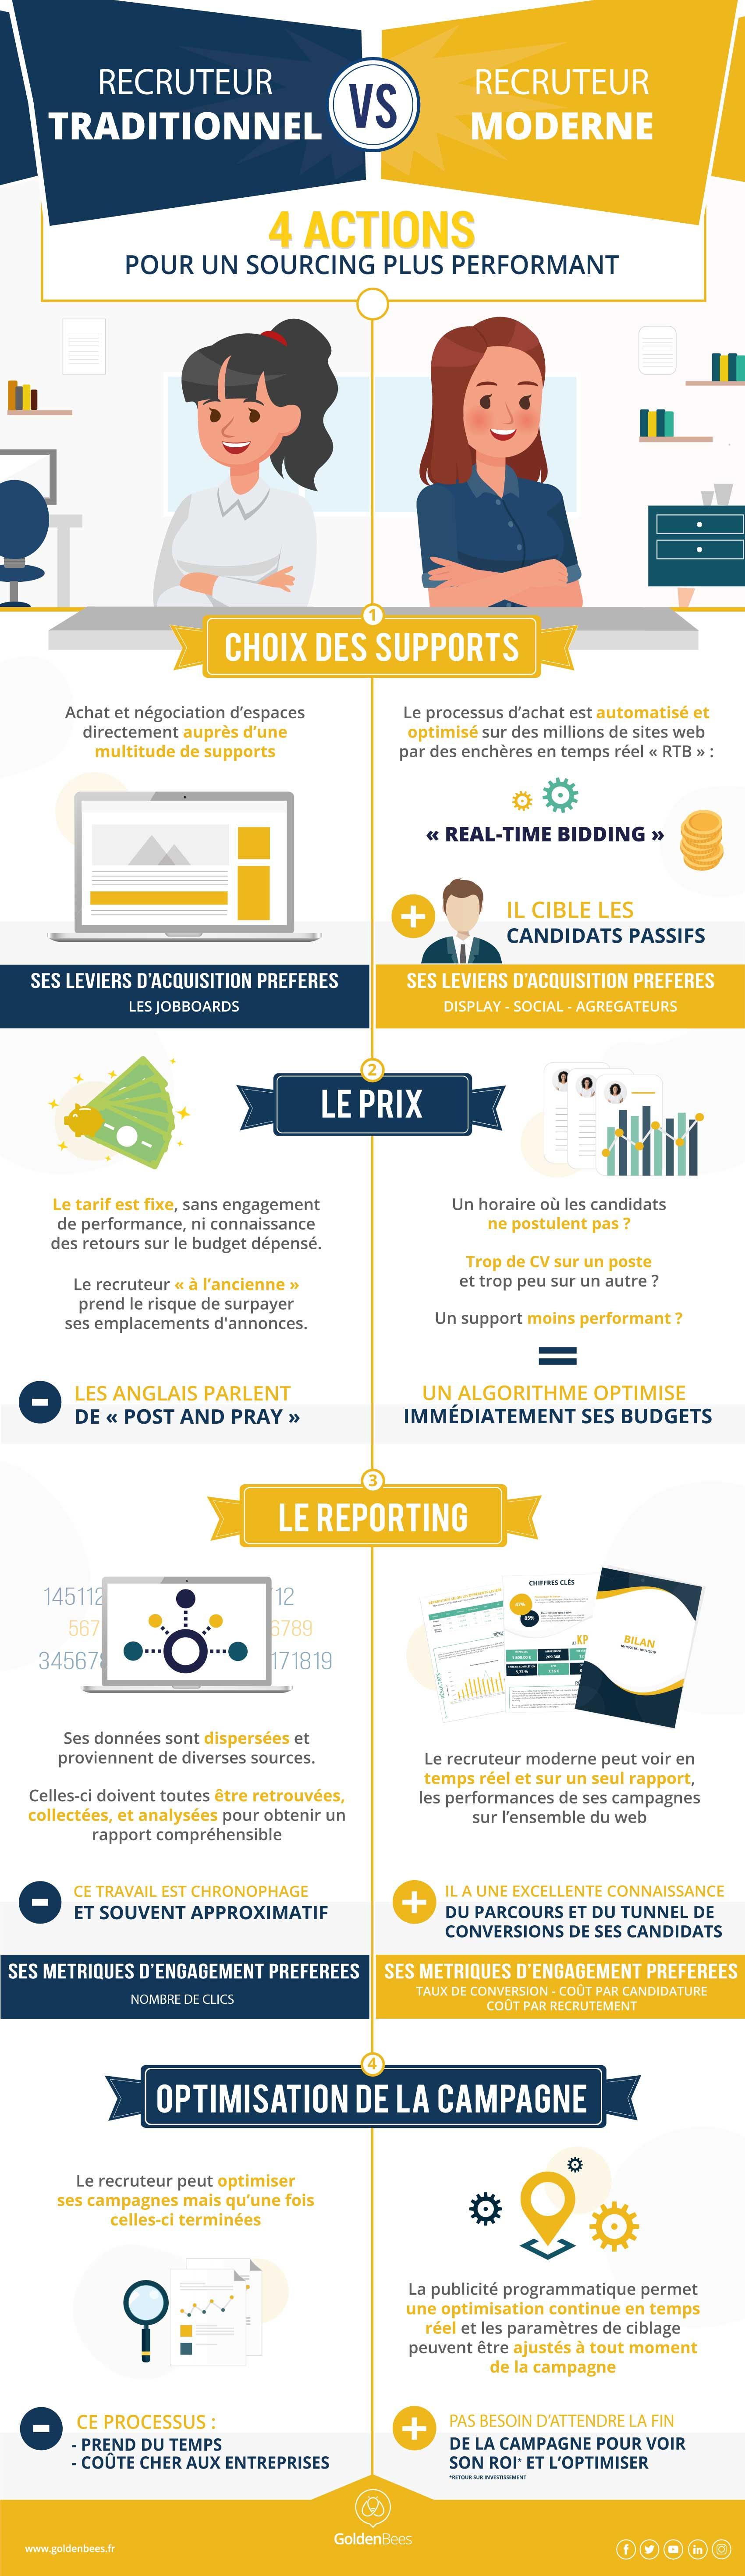 FR-Infographie-recruteur